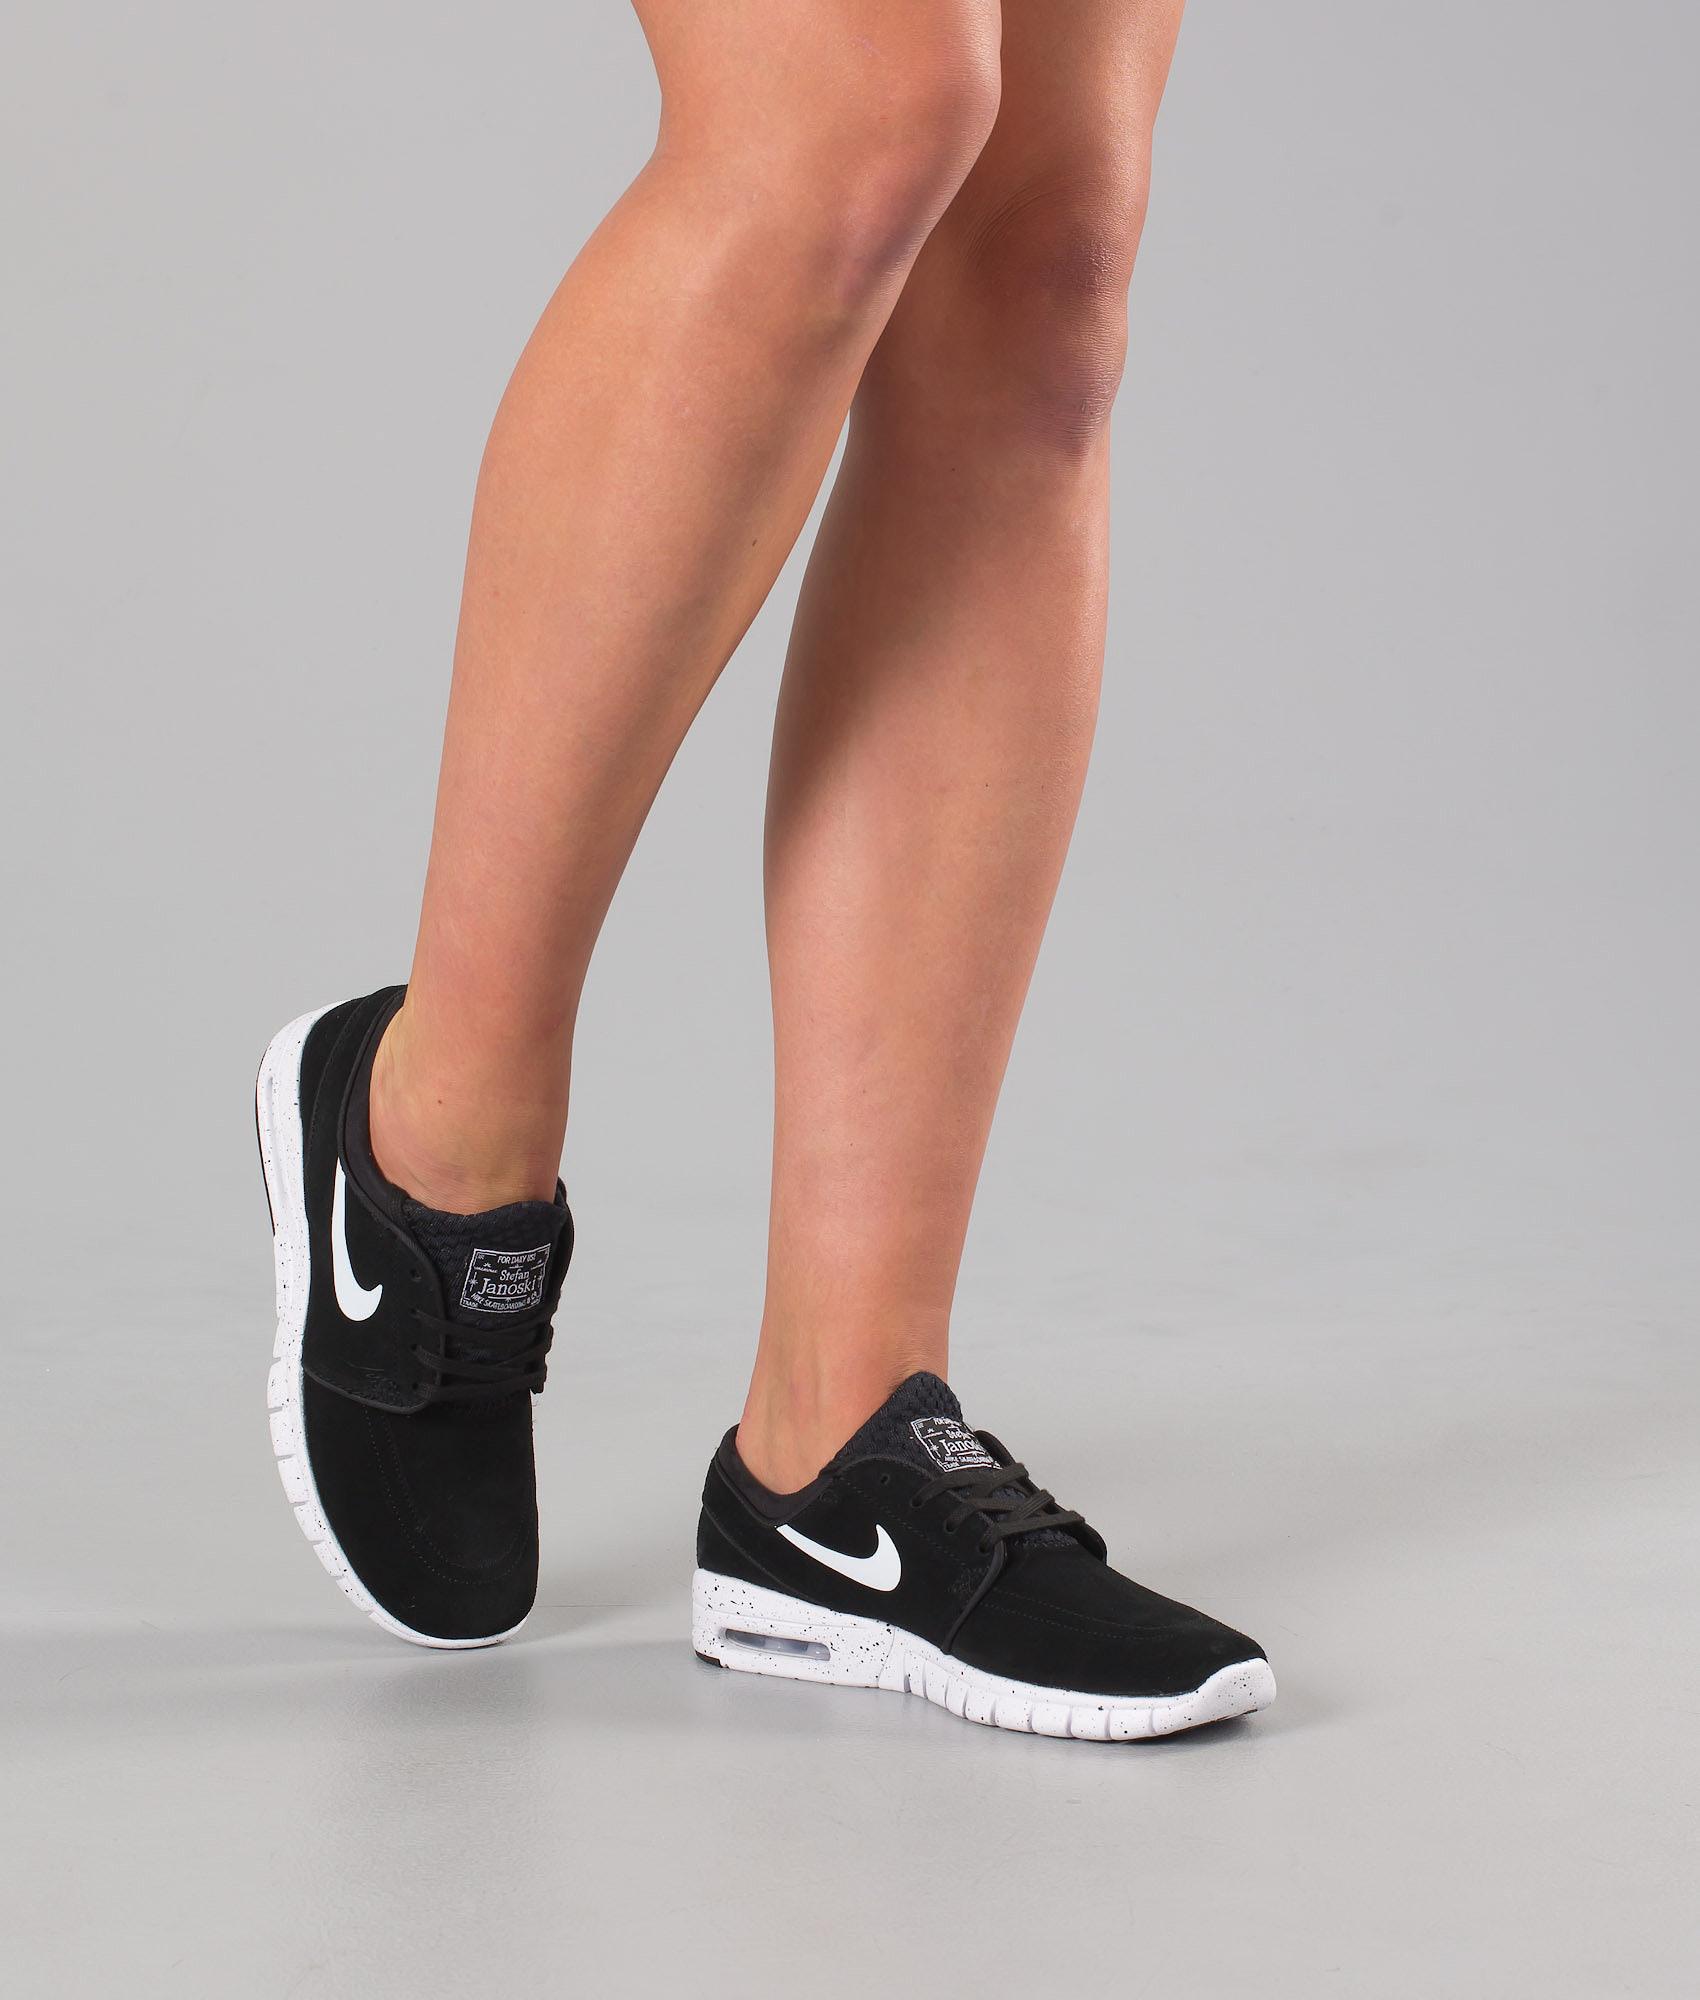 43b36378 Nike Stefan Janoski Max L Unisex Shoes Black/White - Ridestore.com